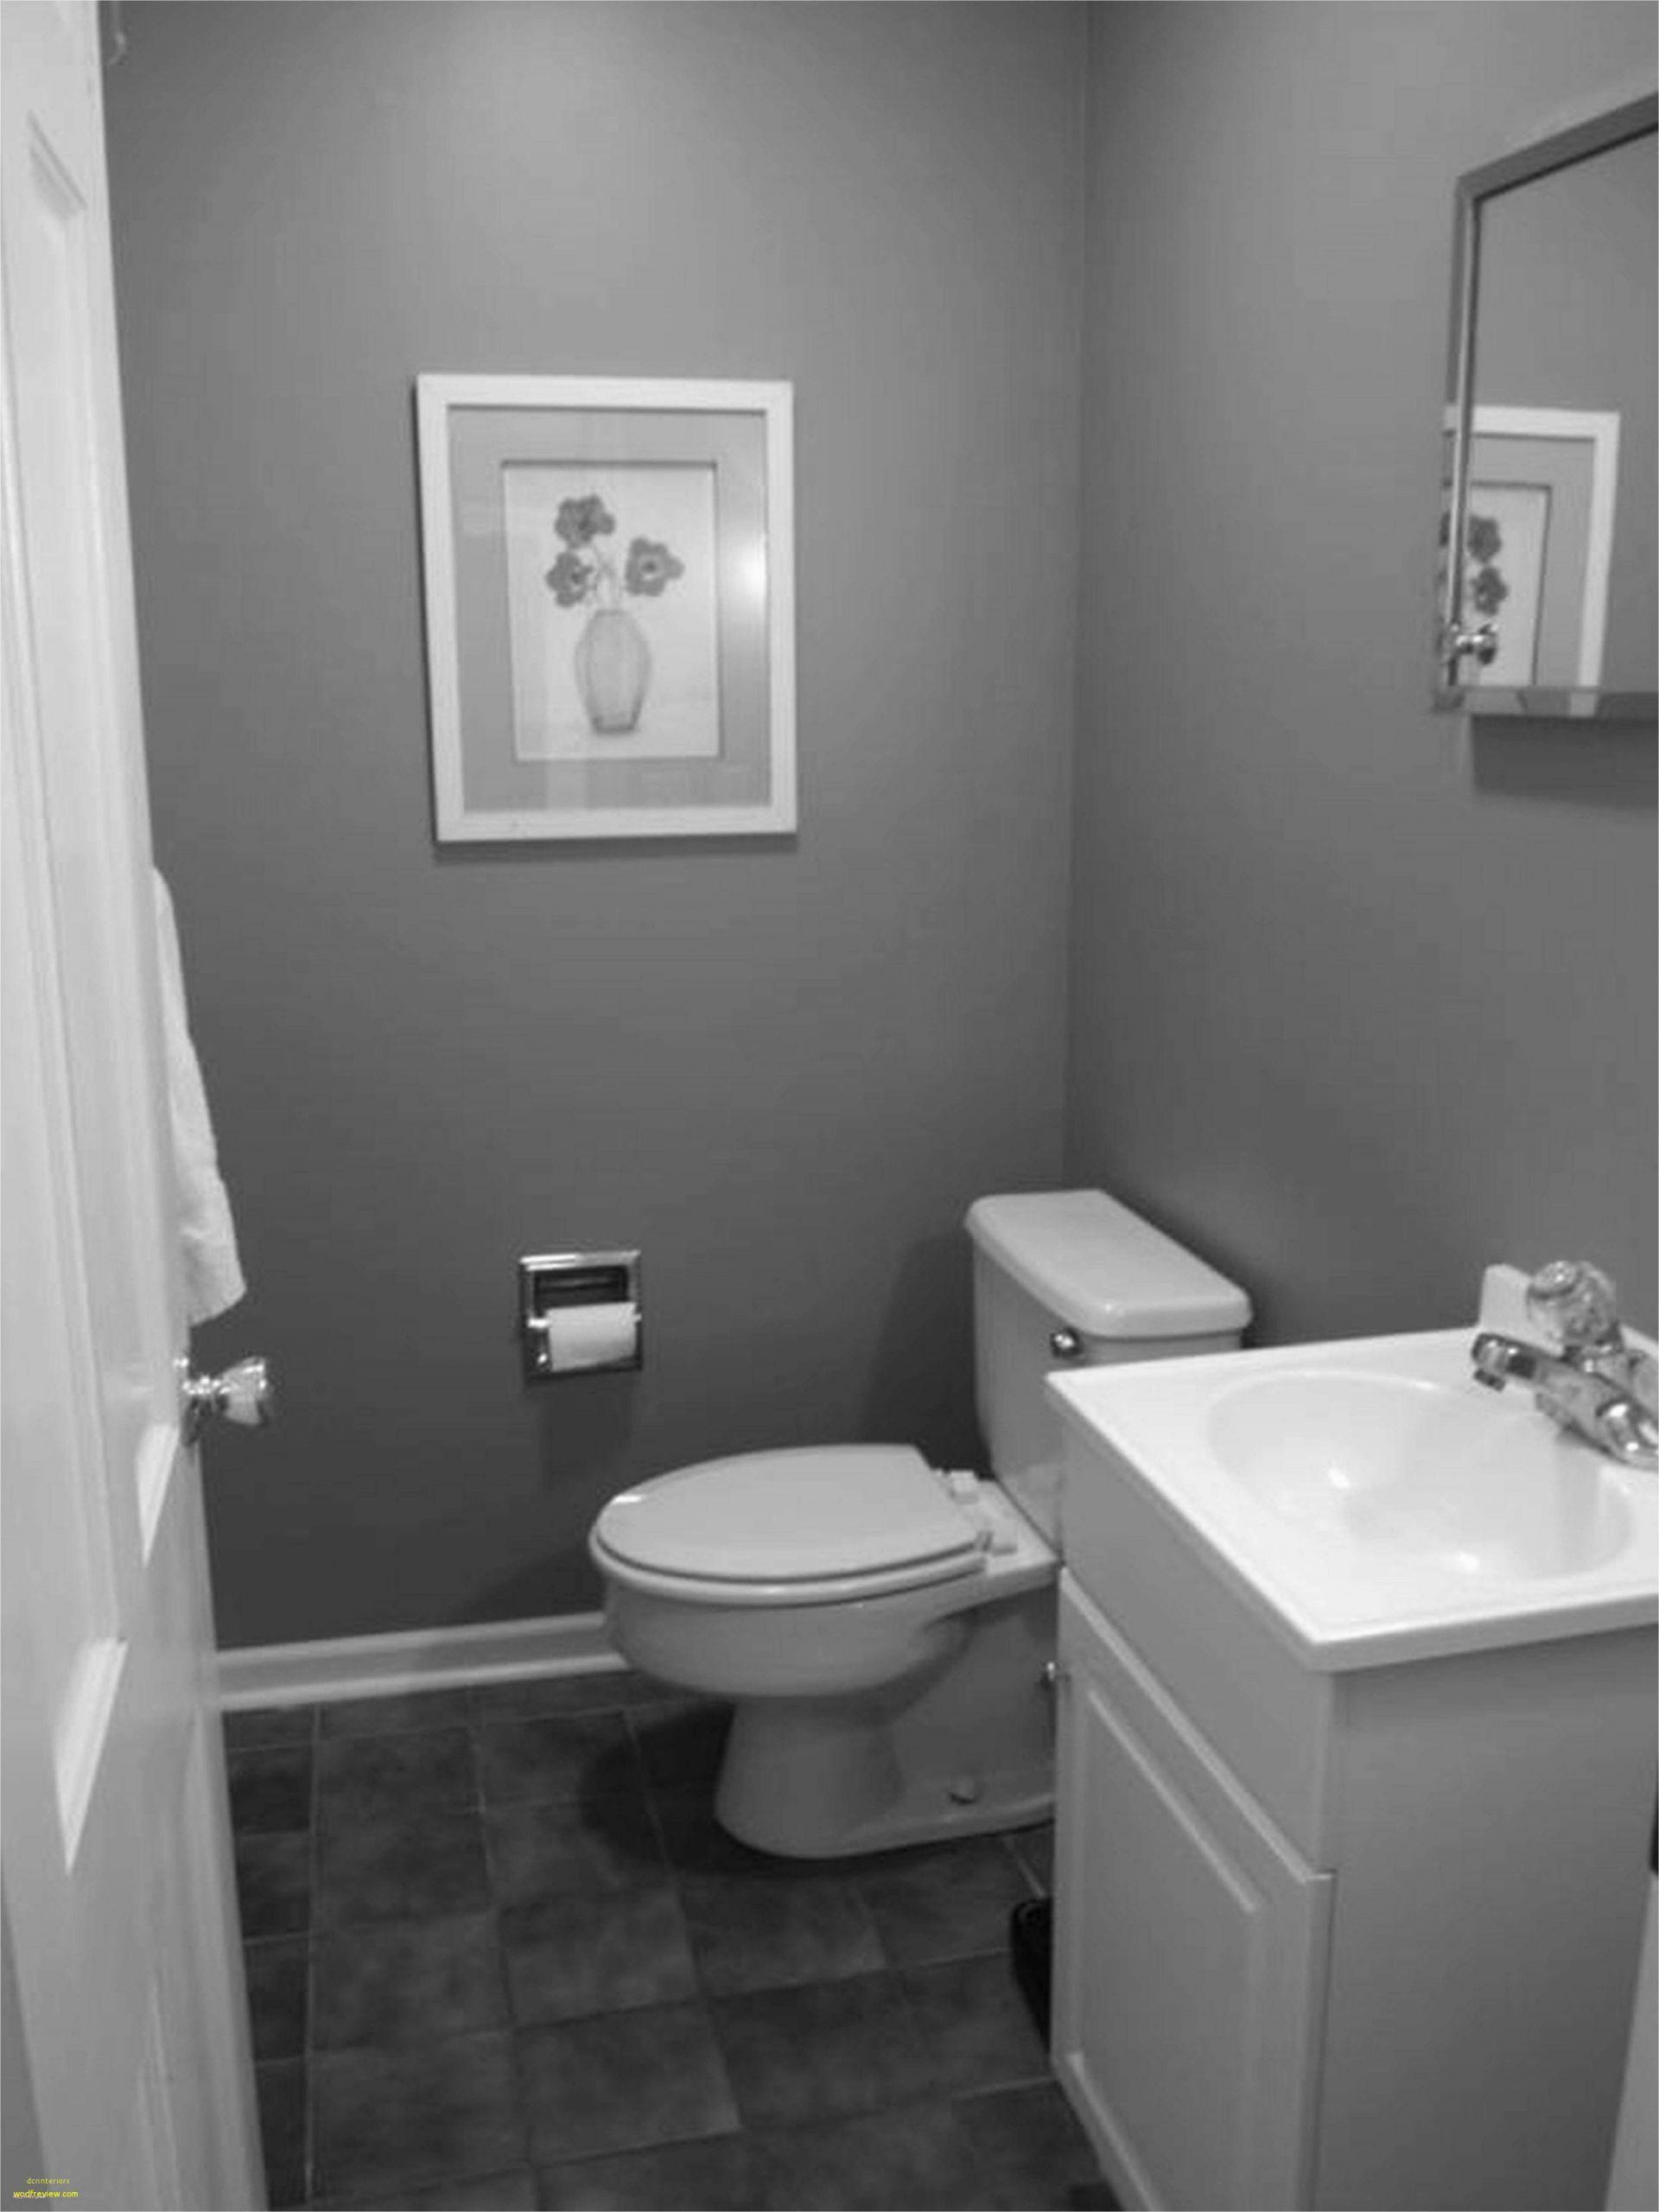 hardwood floor tile in bathroom of 30 elegant tiles and bathrooms plan inside dark grey bathroom tiles fresh white bathroom designs fresh grey bathroom 0d archives modern house